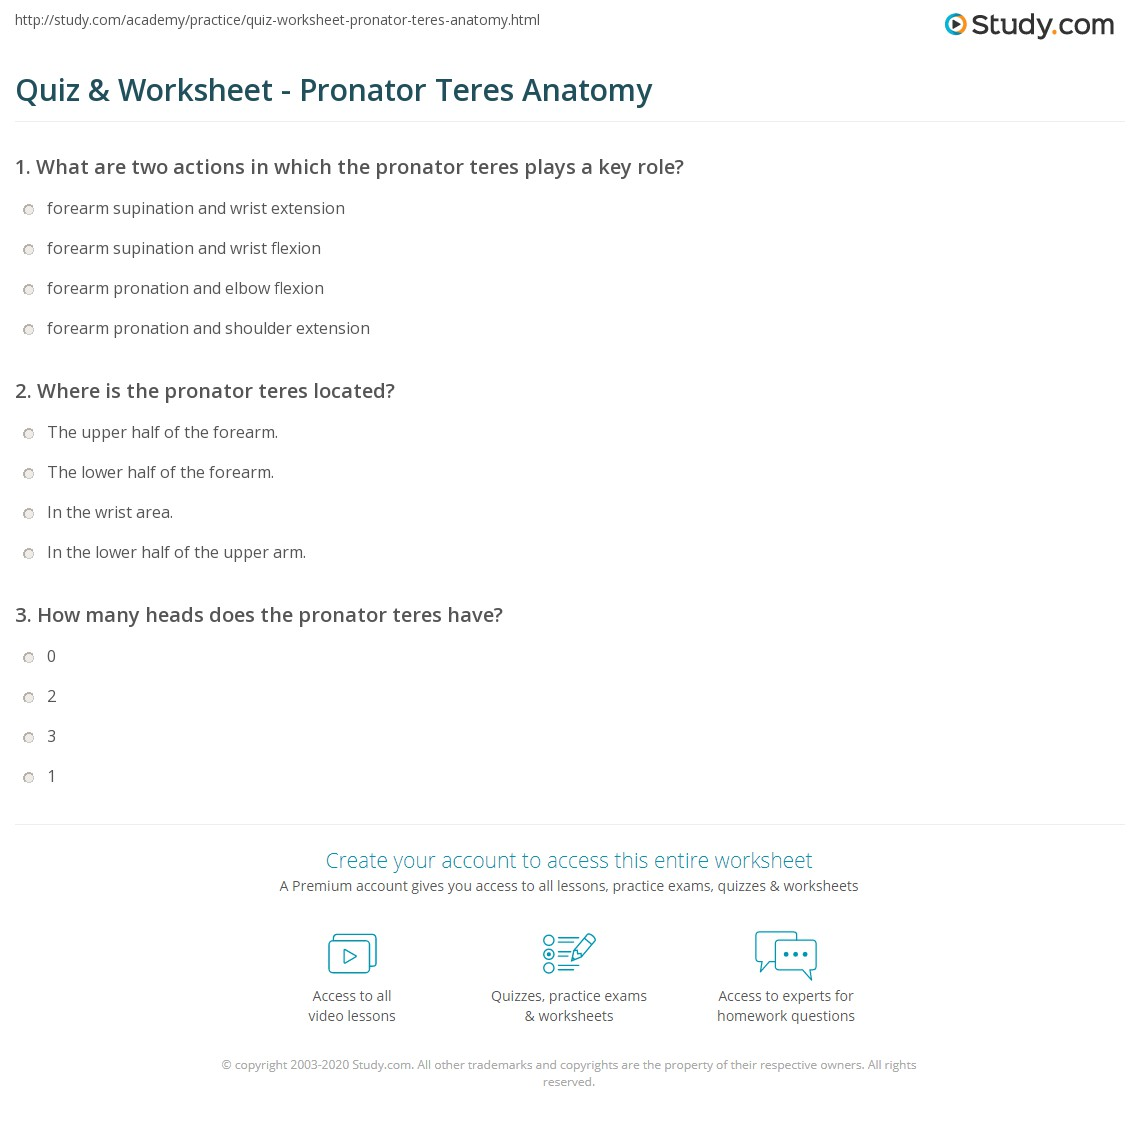 Quiz & Worksheet - Pronator Teres Anatomy   Study.com